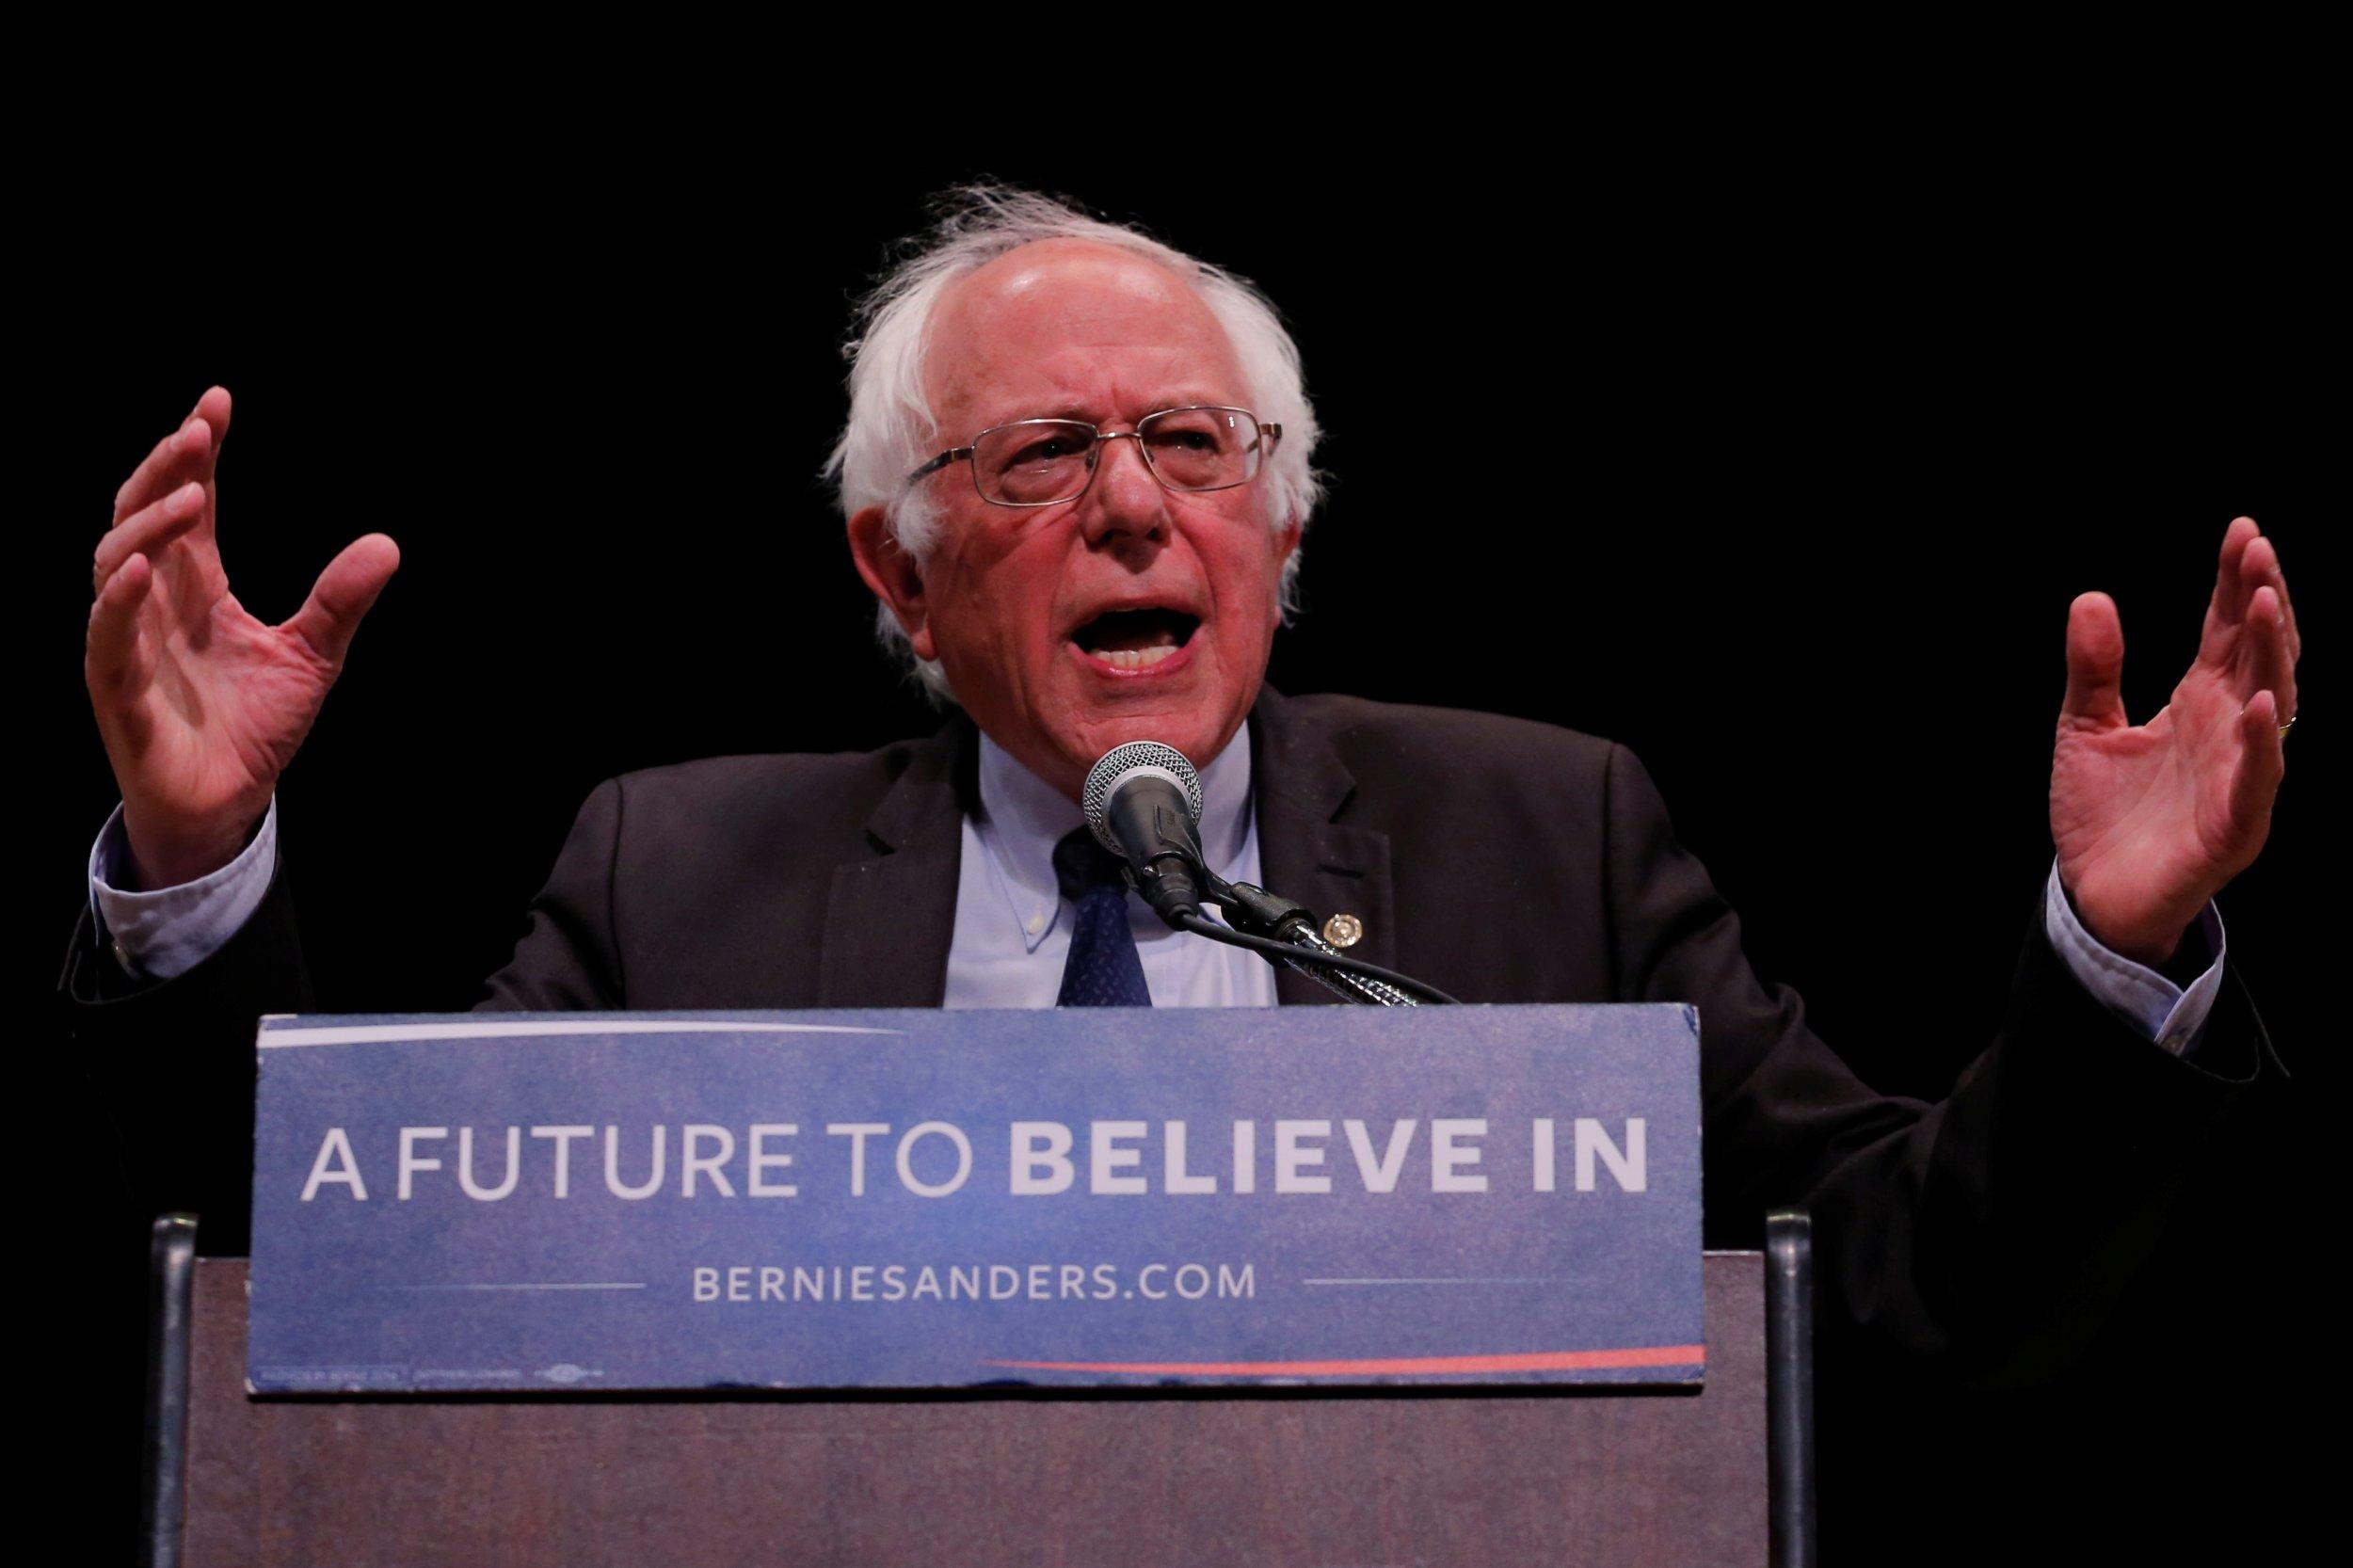 Bernie Sanders says vote Hillary Clinton